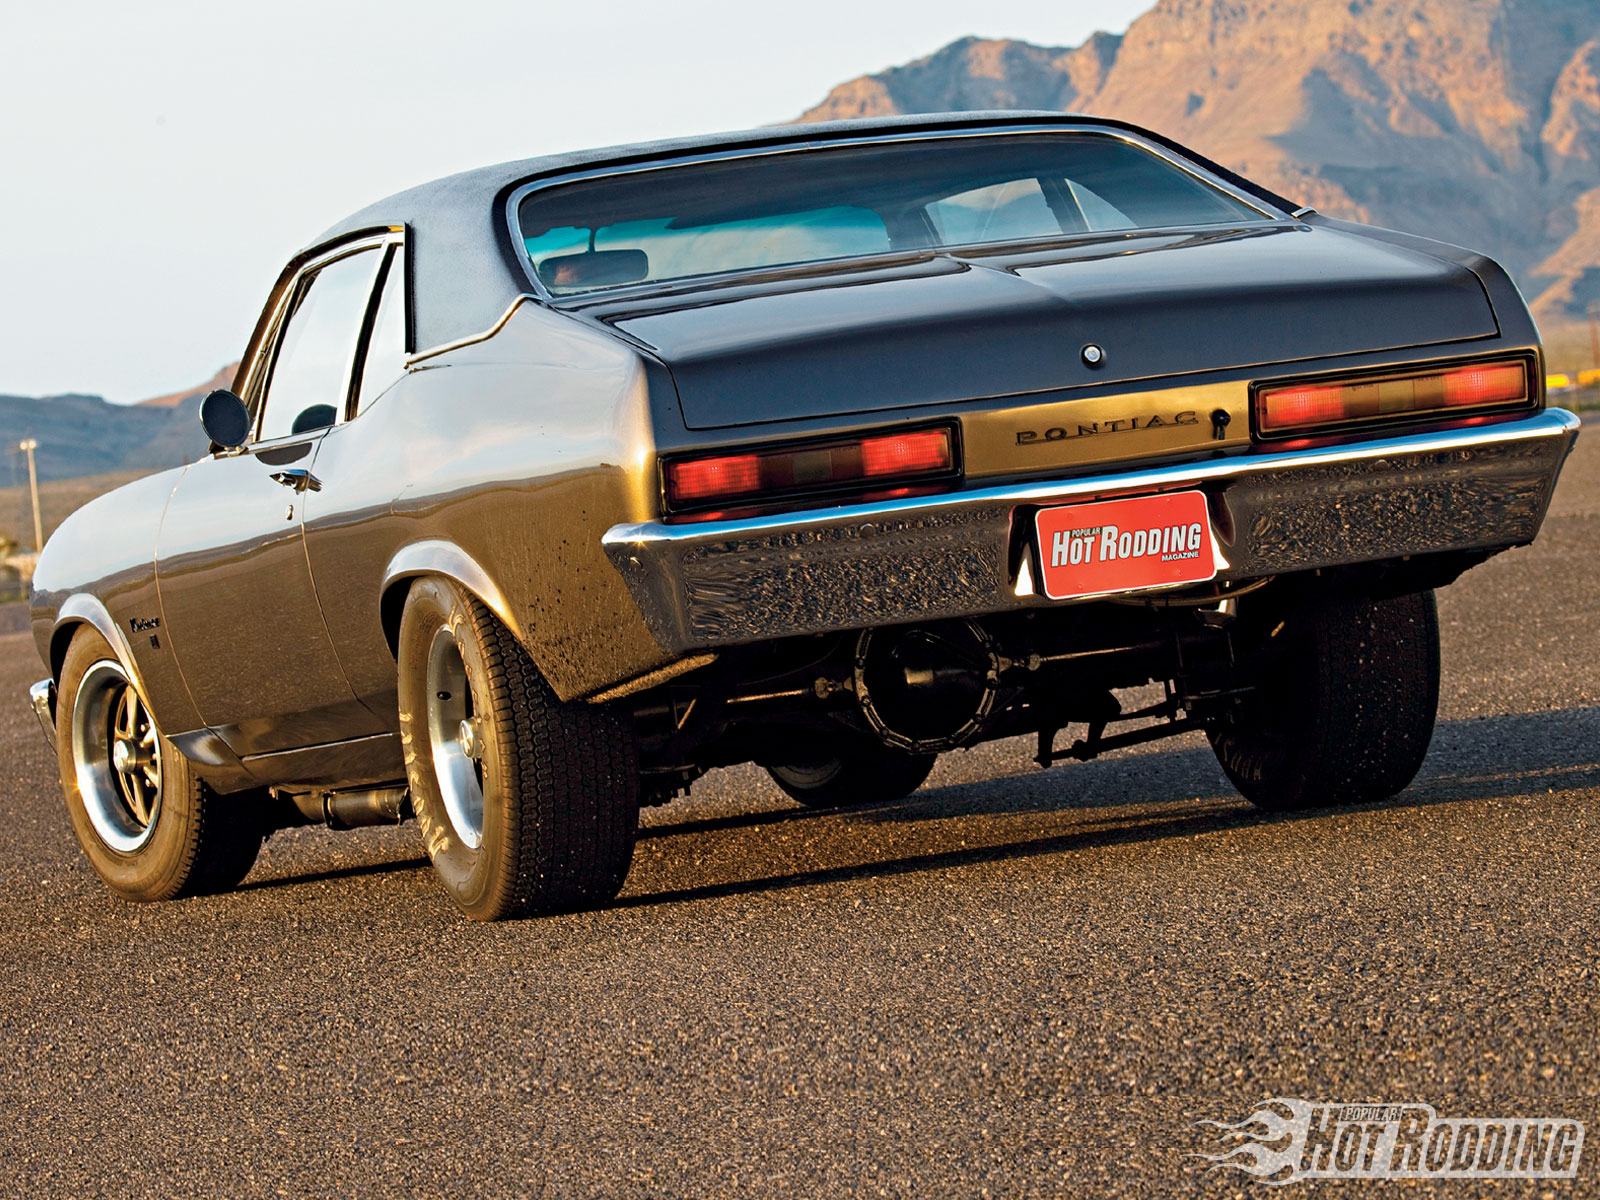 Hot Rod E Kustom Pontiac Ventura 1971 Street Rod